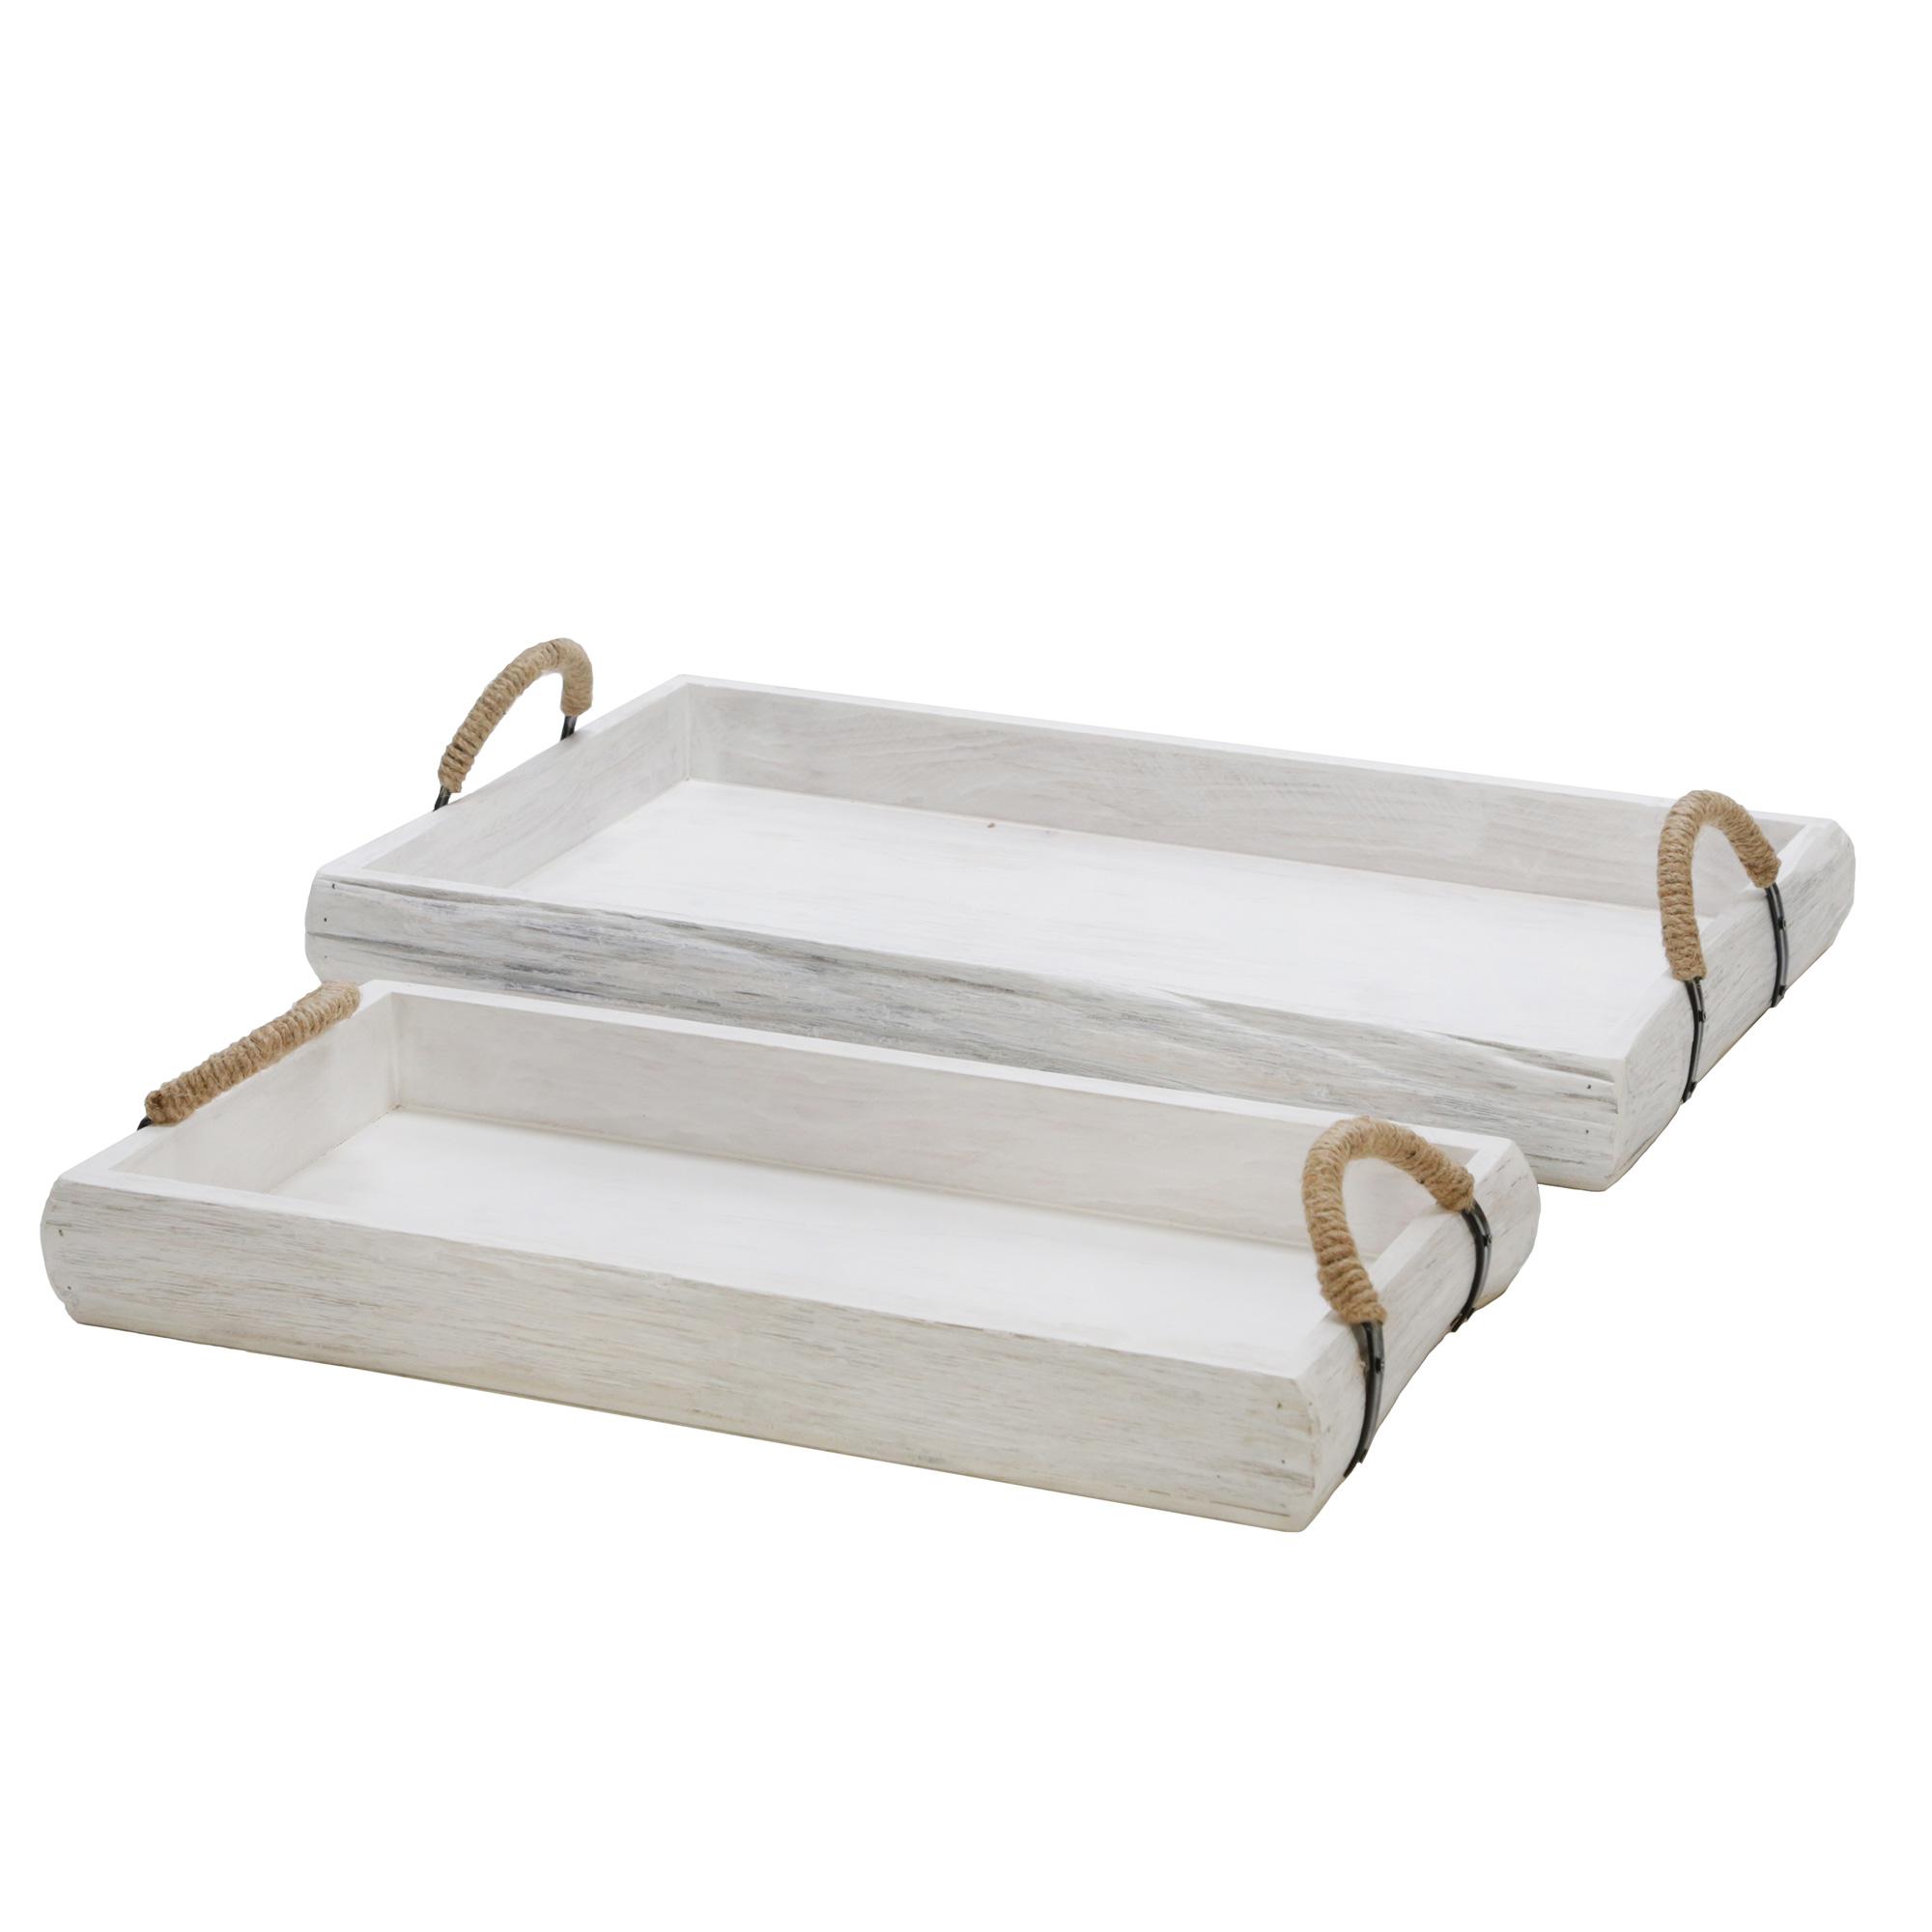 Sagebrook | Heartland Home White Wash Wood Trays